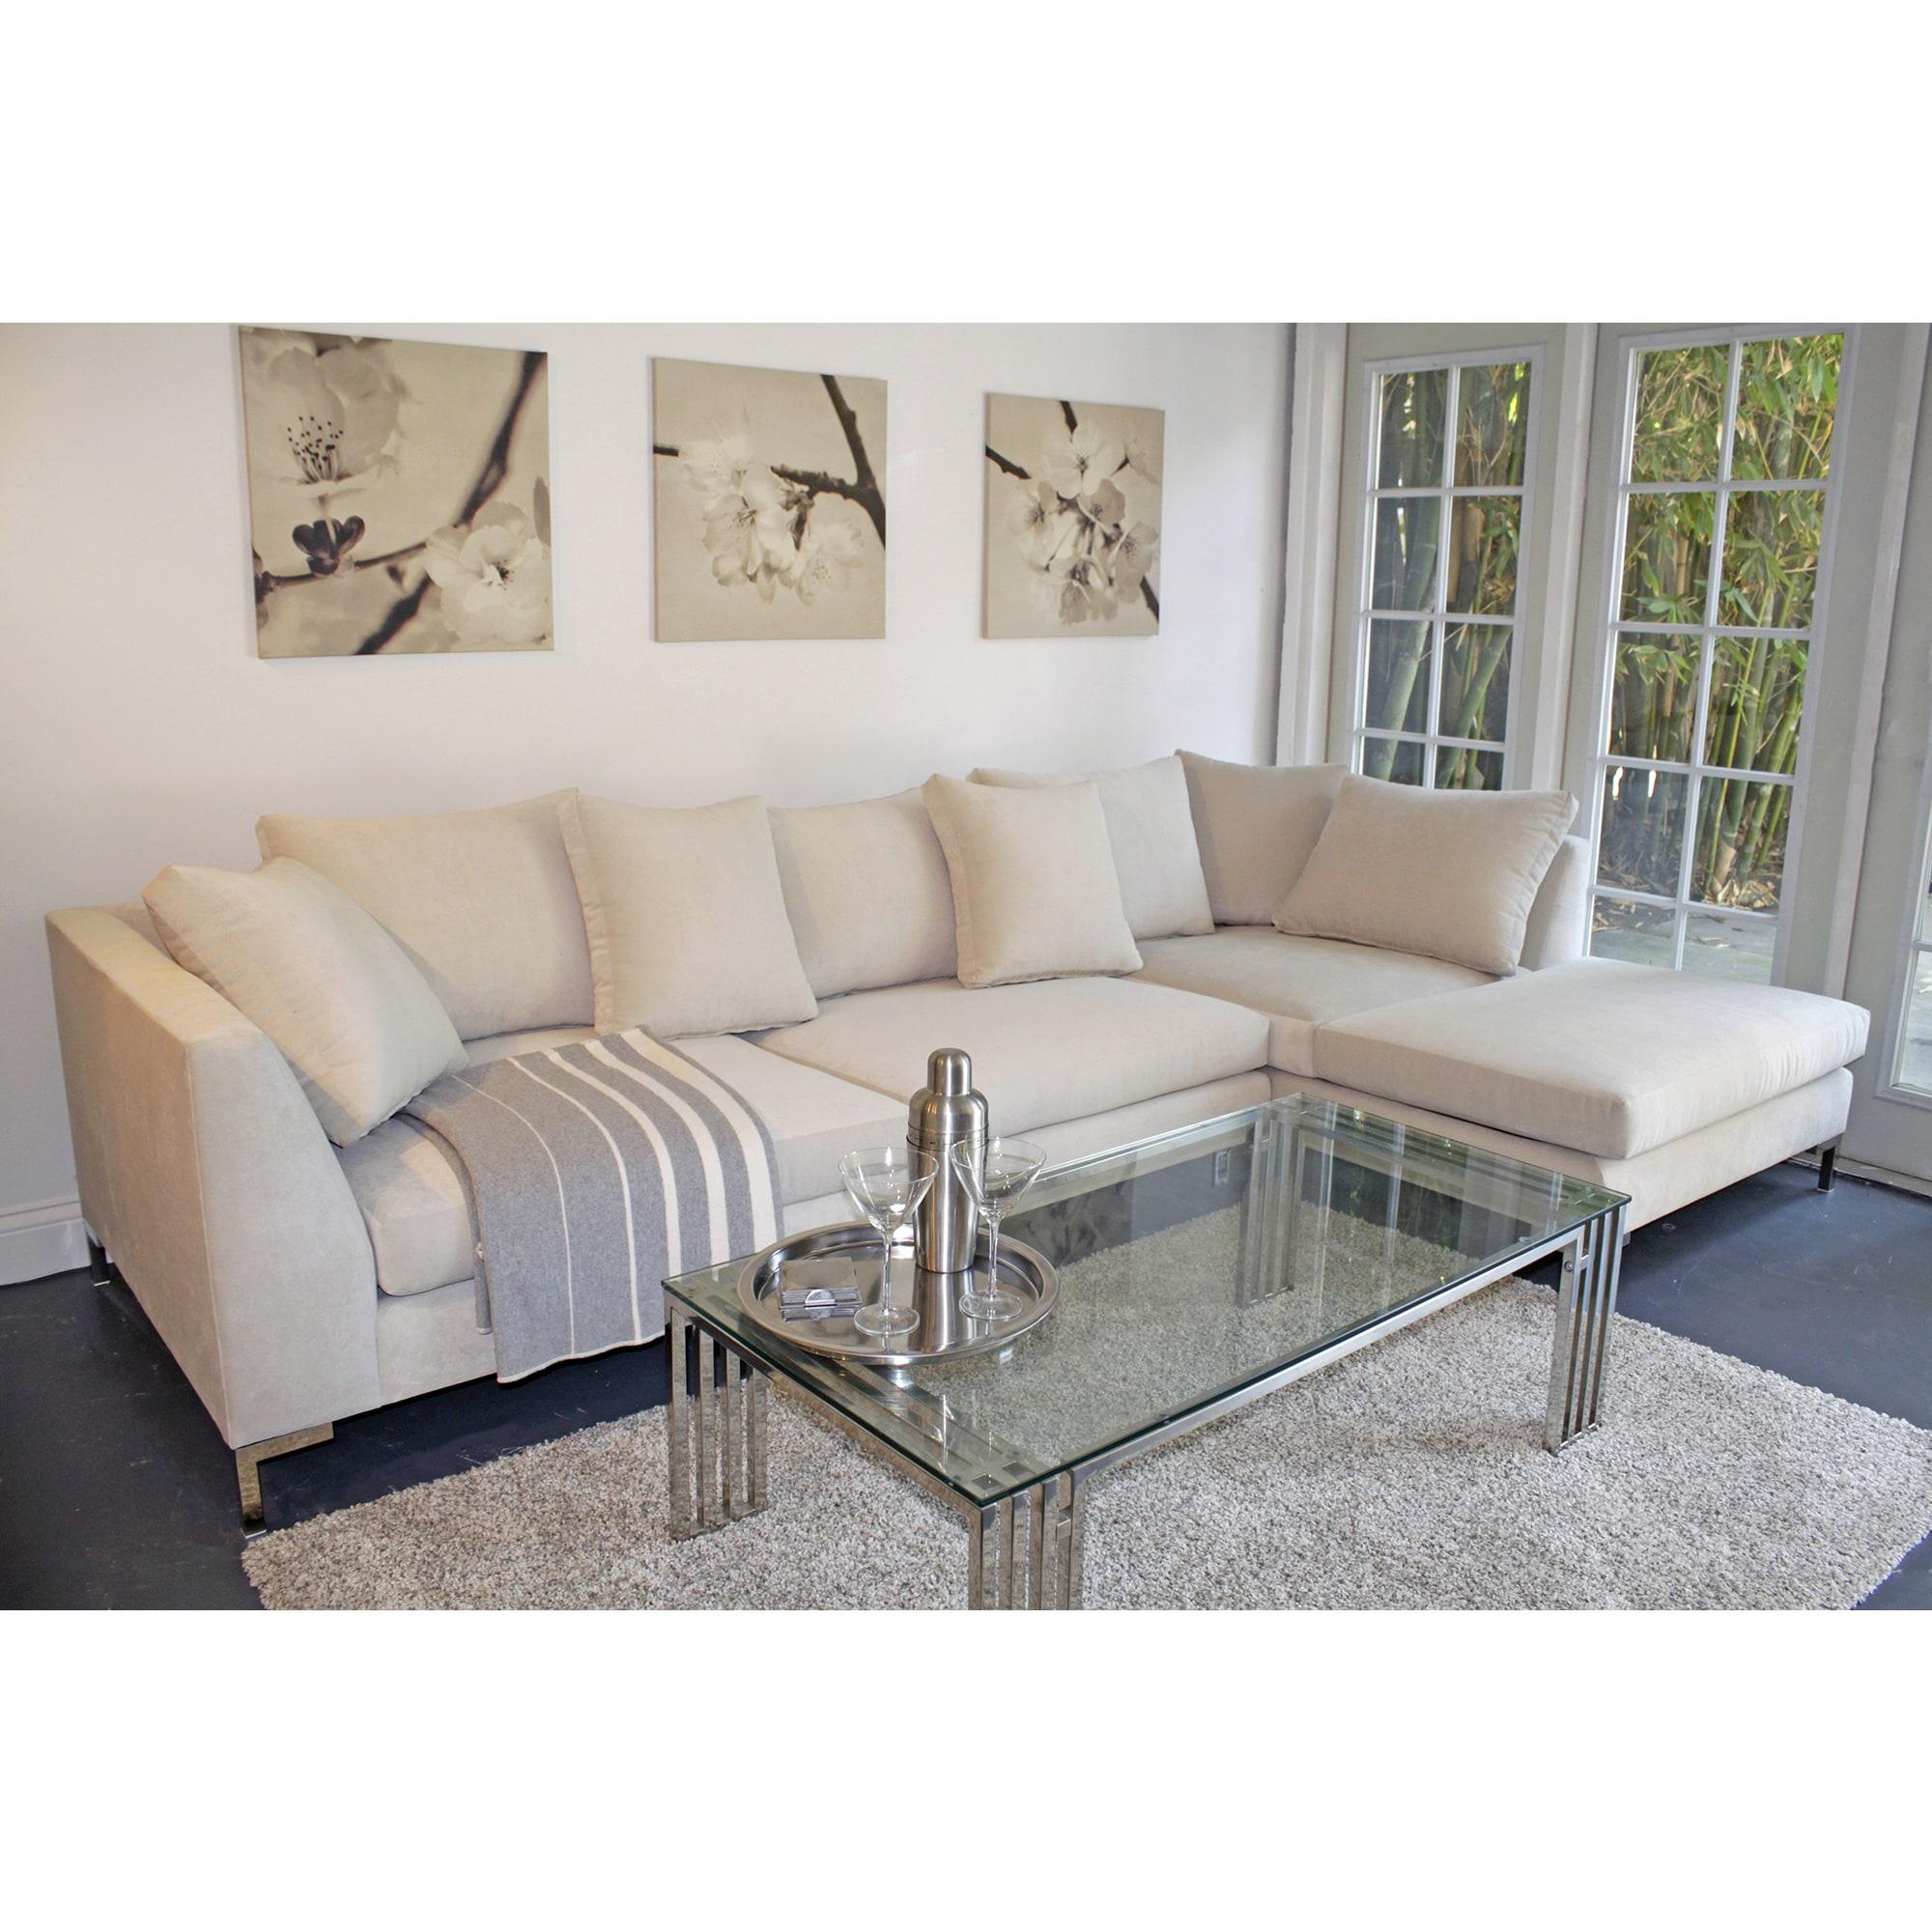 Excellent Decenni Custom Furniture Divina Bone 9 5 Foot Modern Sectional Sofa Frankydiablos Diy Chair Ideas Frankydiabloscom